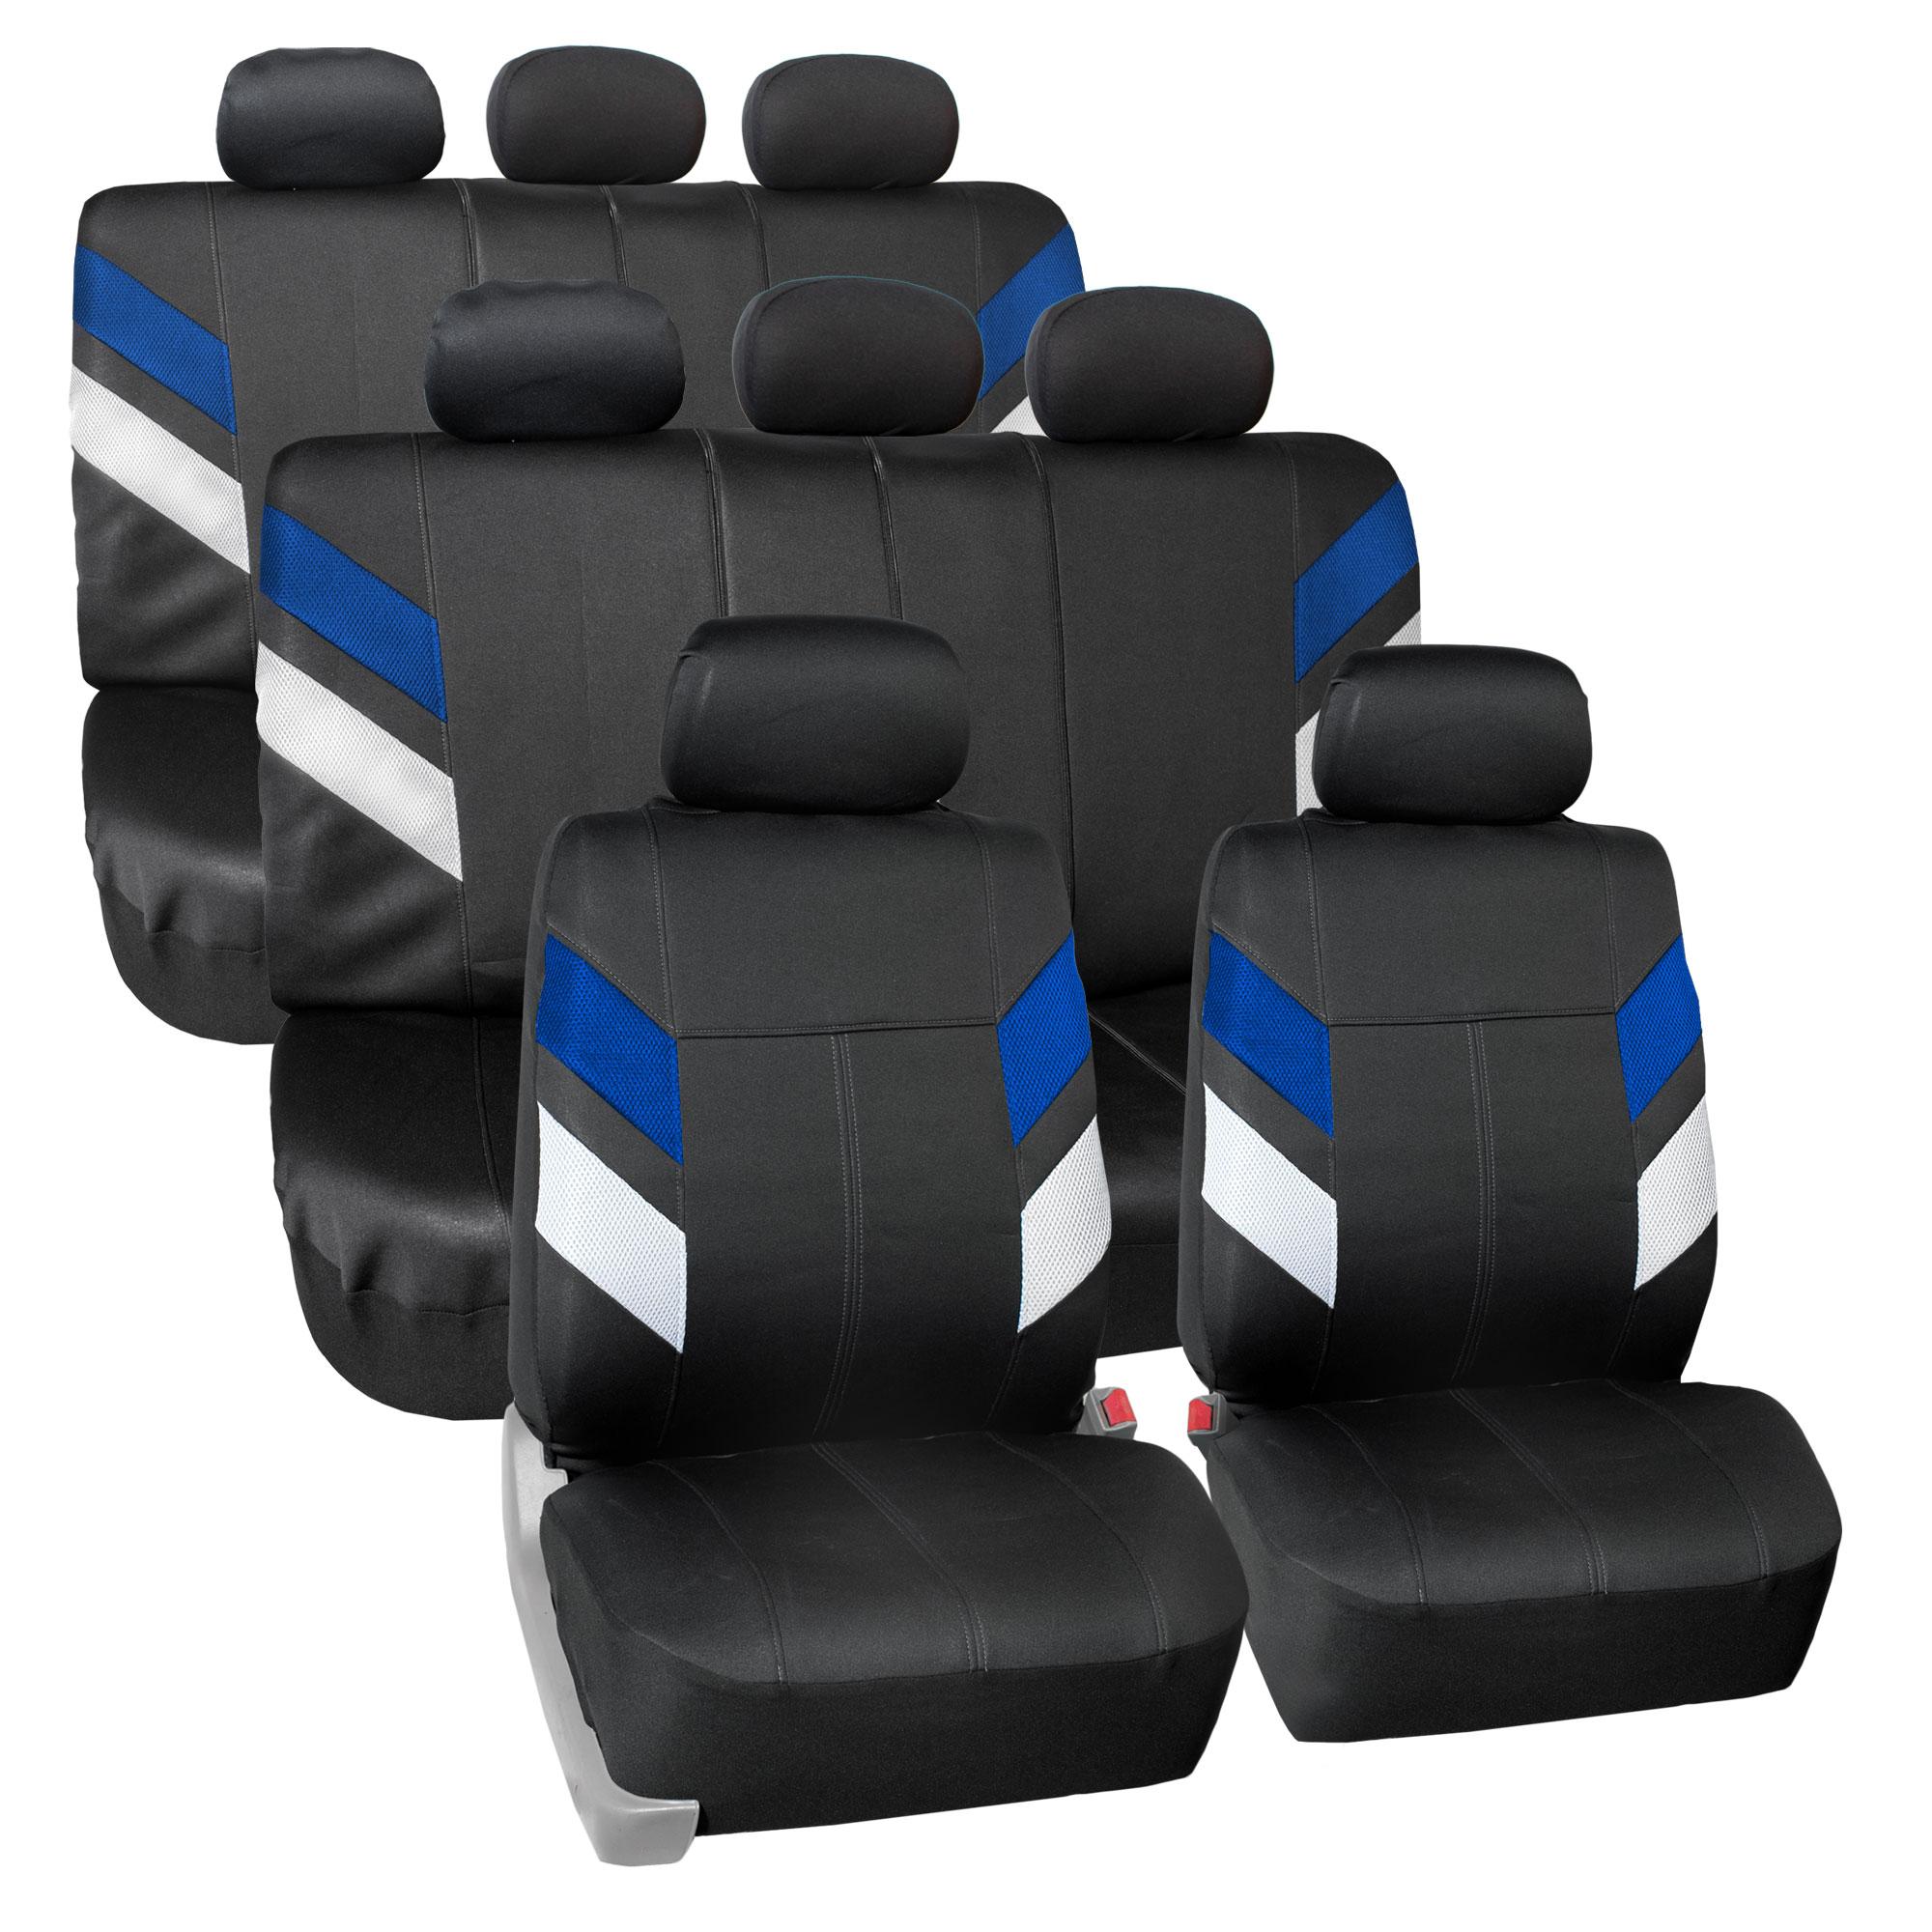 Neoprene 3 Row 8 Seaters Seat Covers